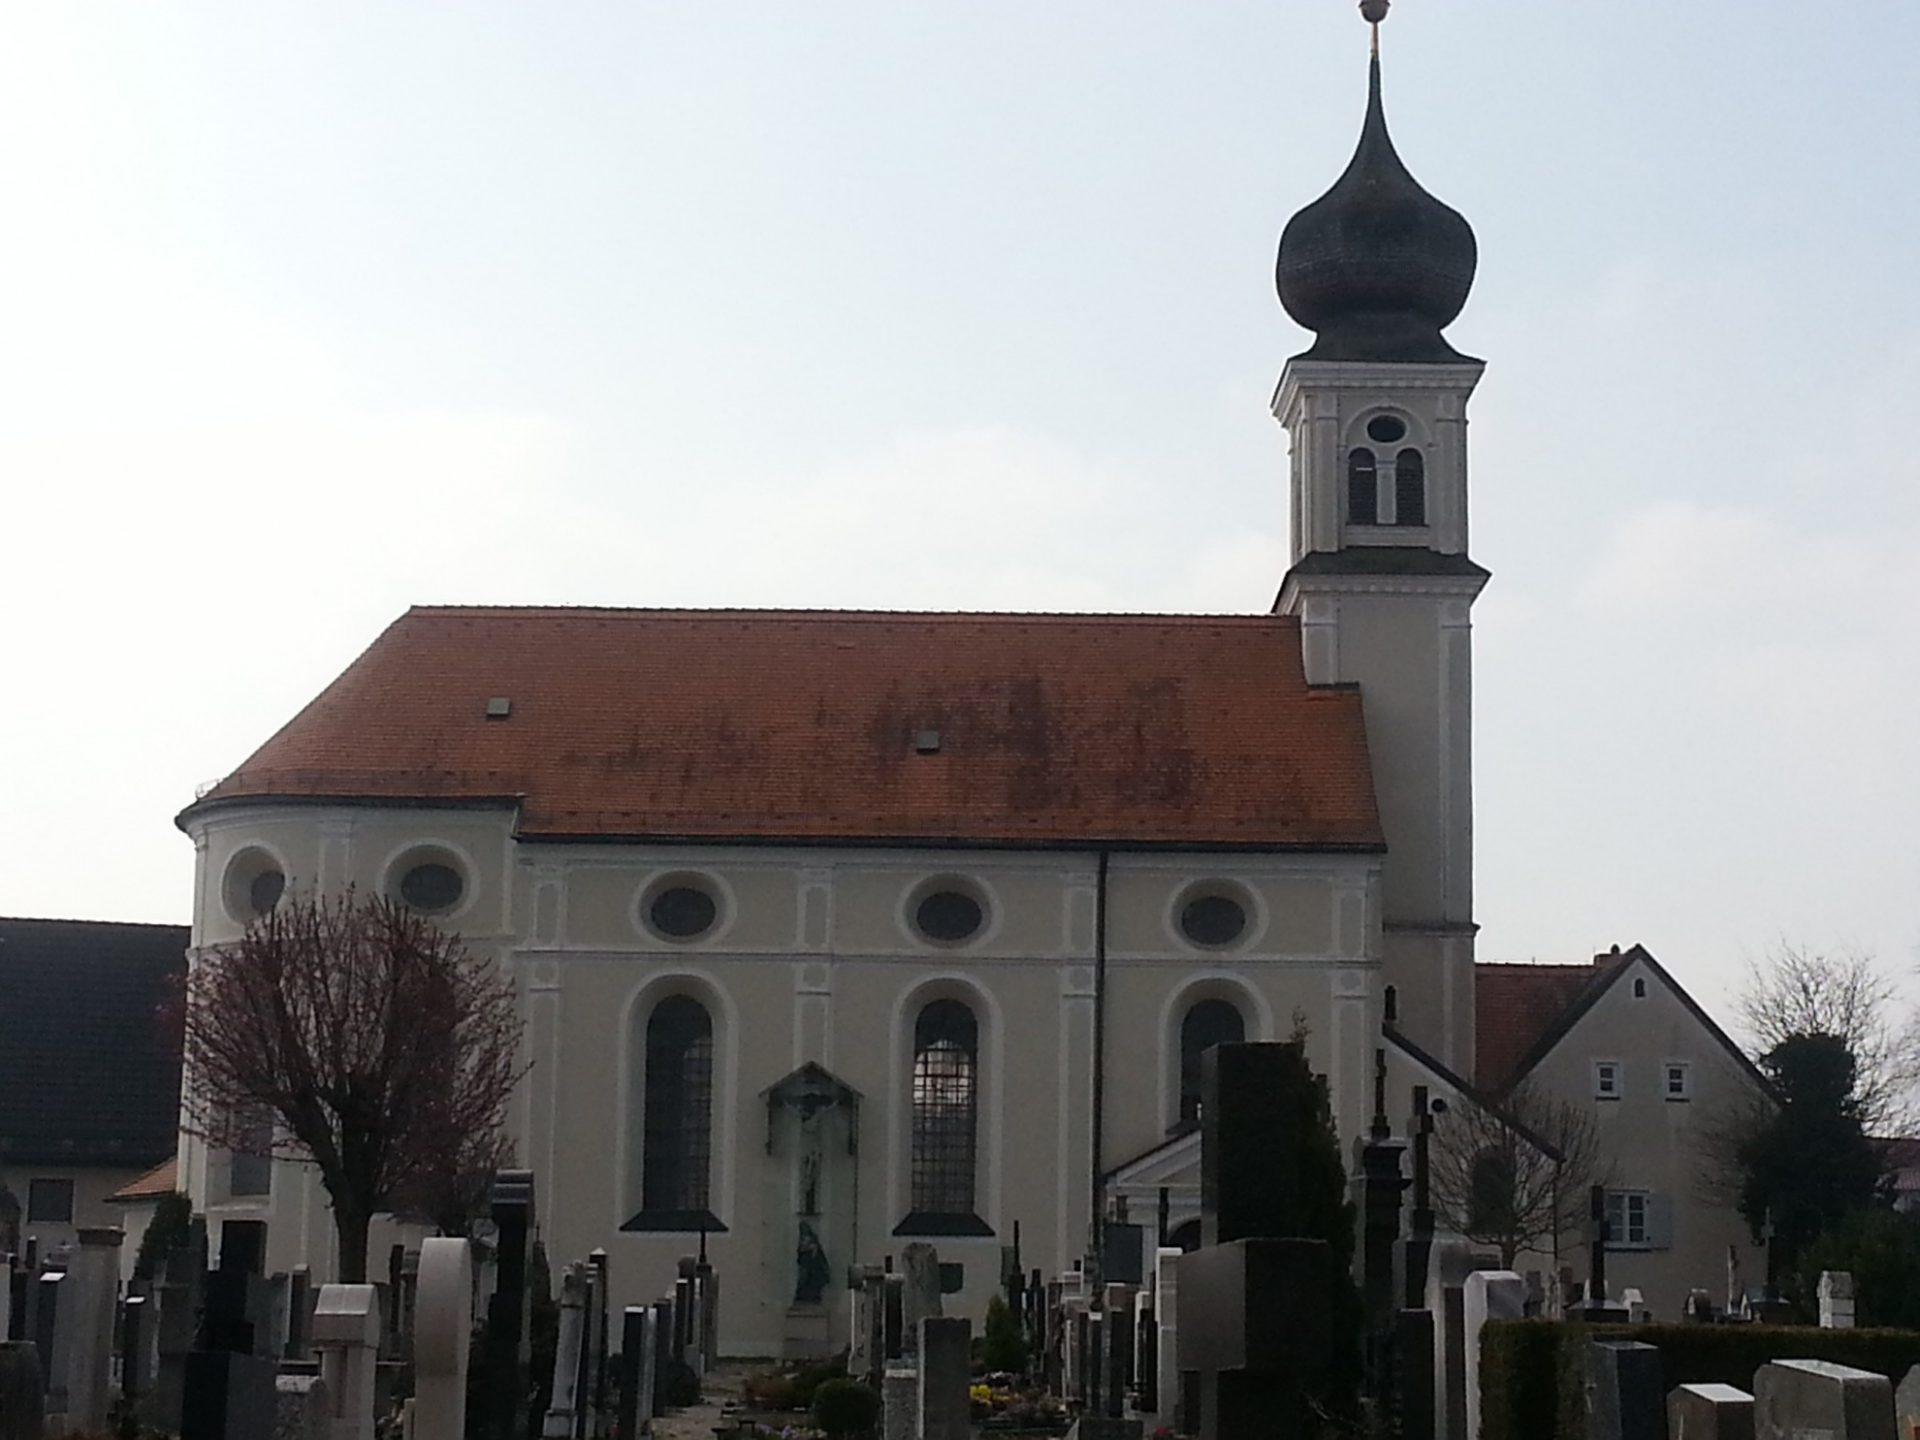 Friedhofskirche St. Paul Erding